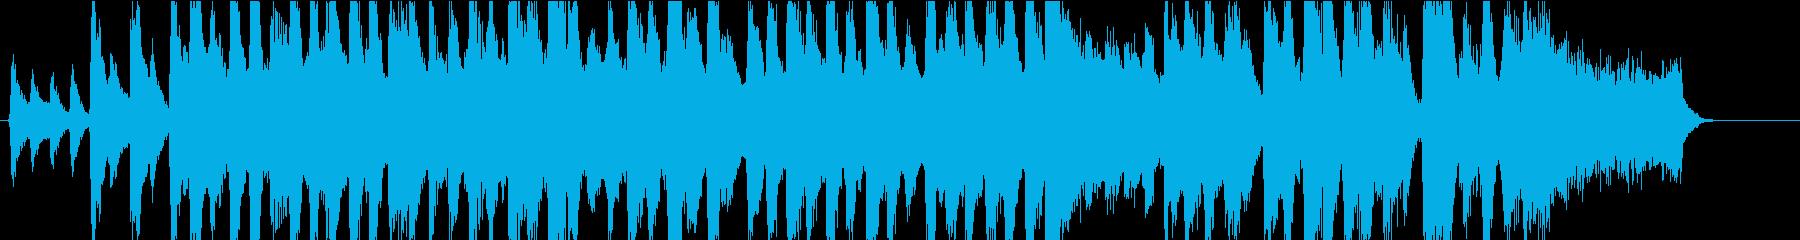 CMサイズ クリスマス・ソングですの再生済みの波形